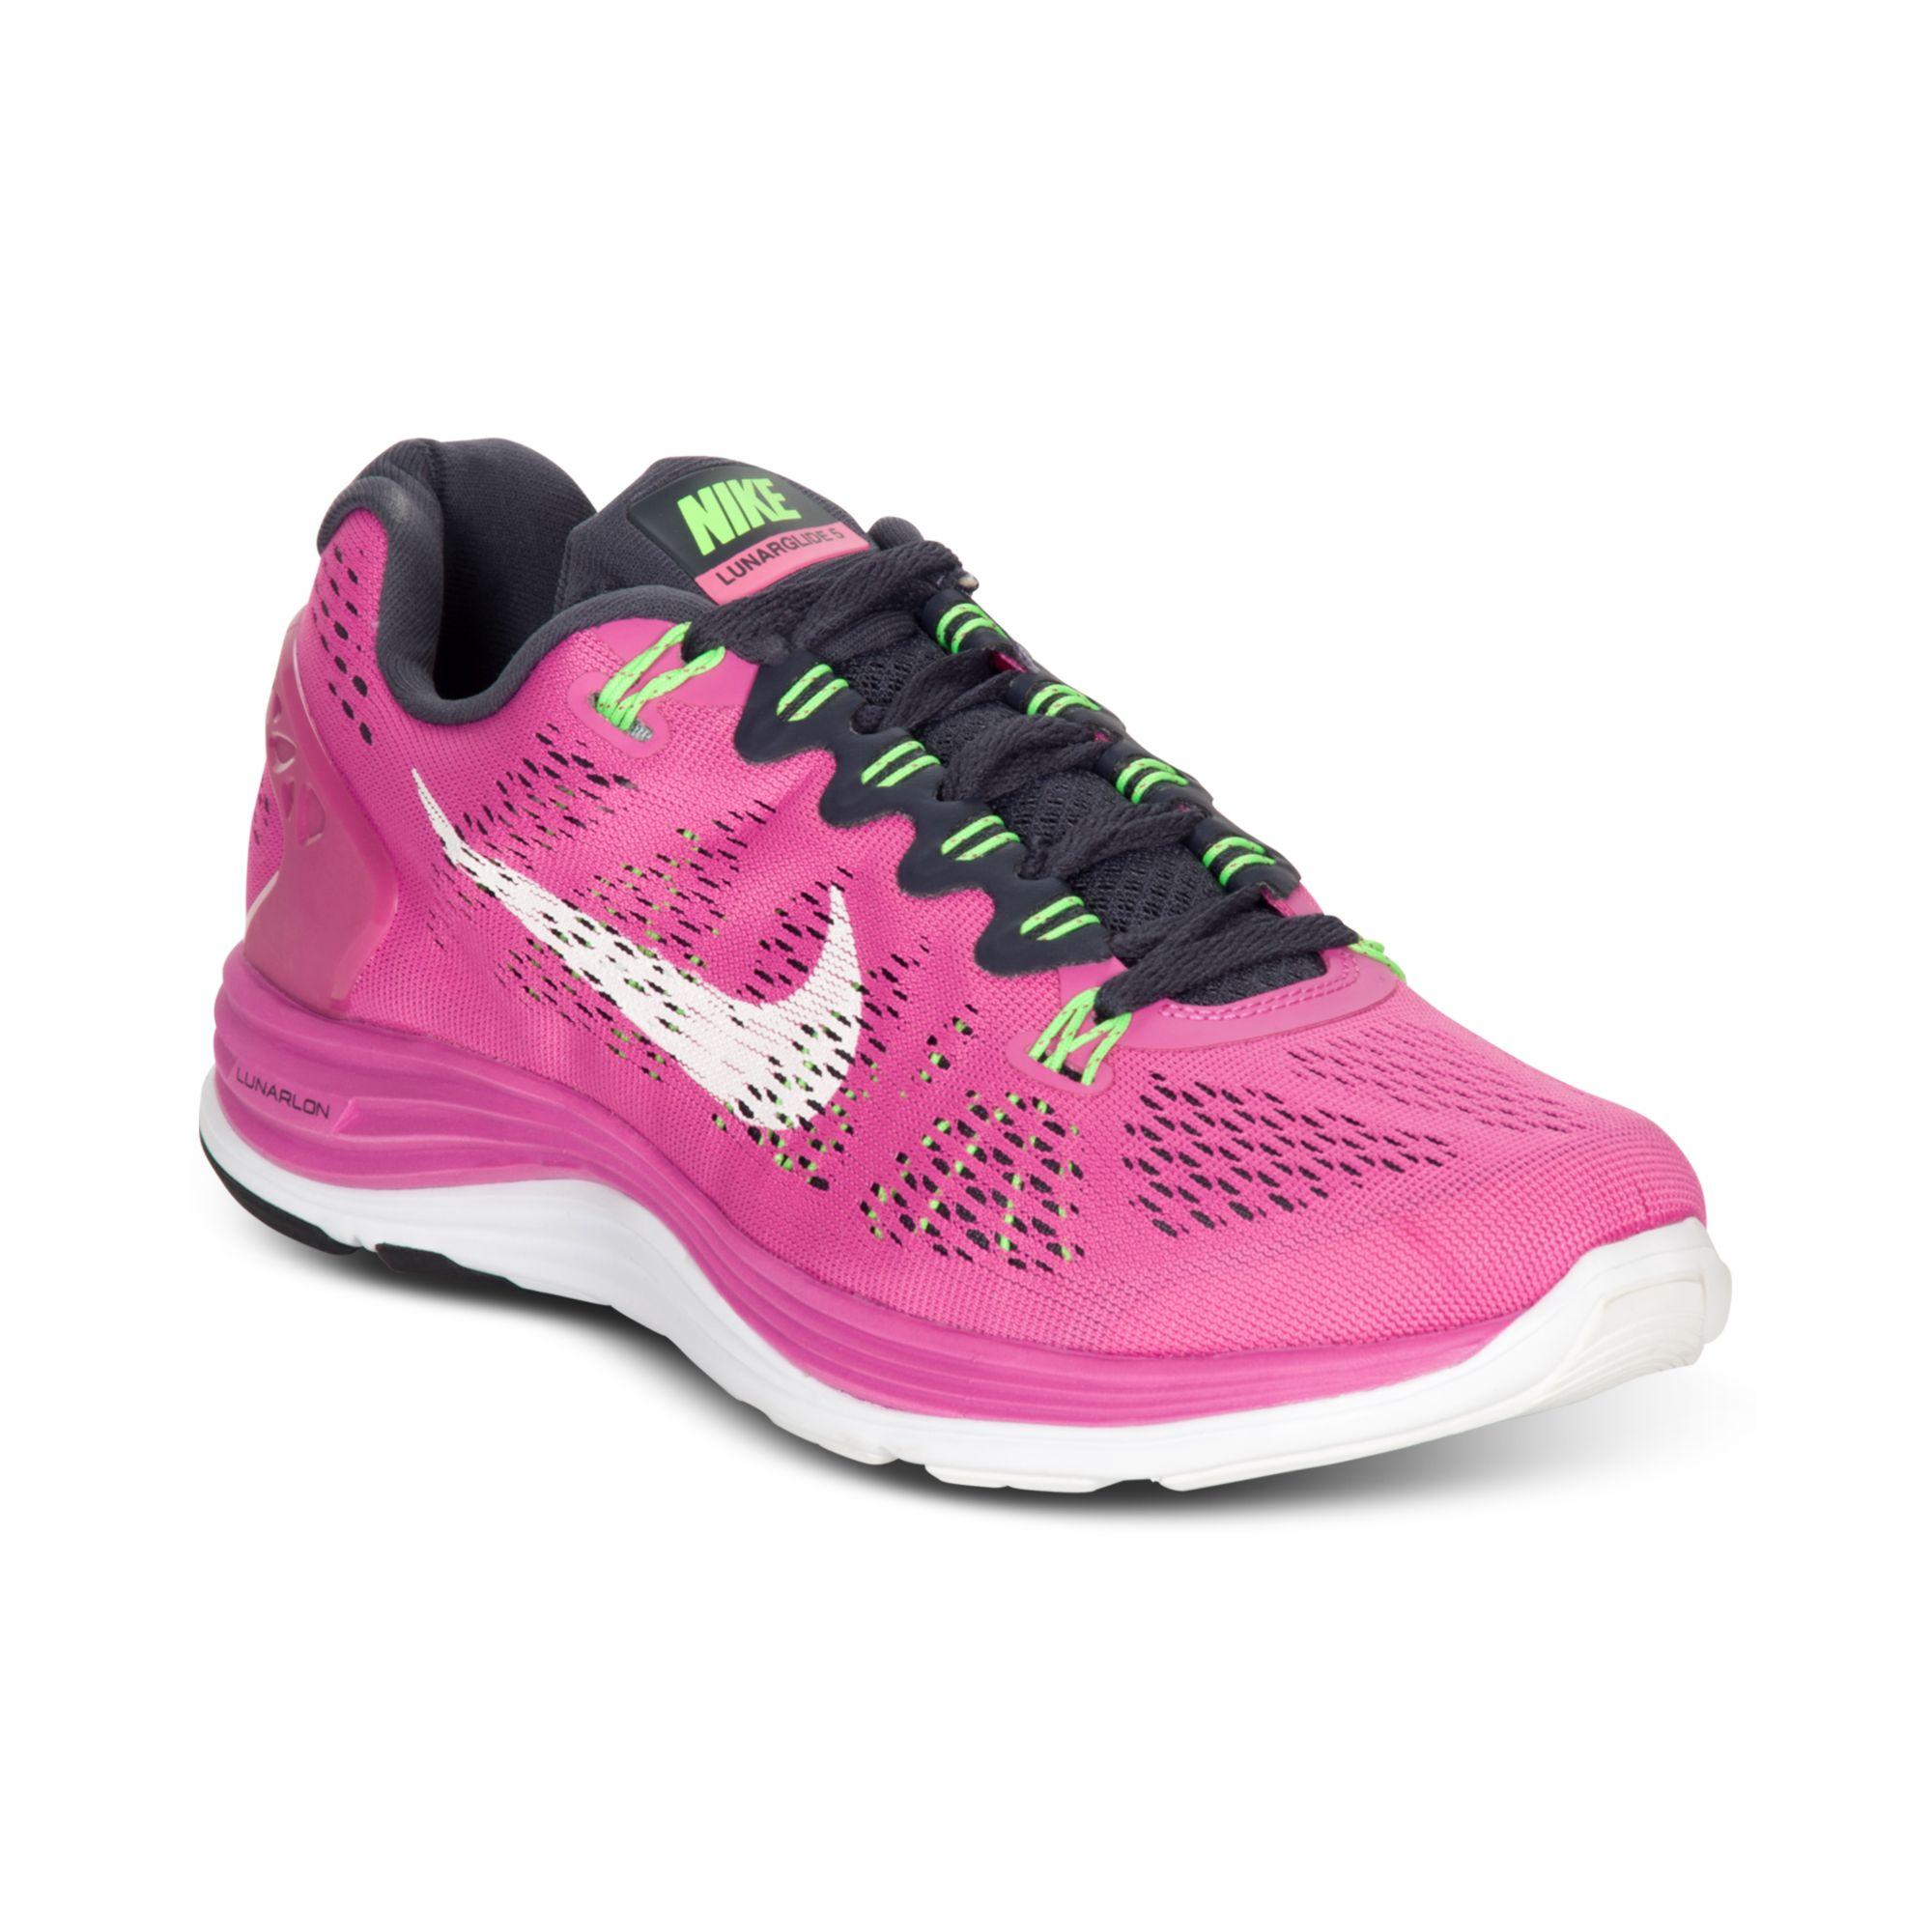 buy popular 753b1 d0b96 Lyst - Nike Lunarglide 5 Running Sneakers in Pink